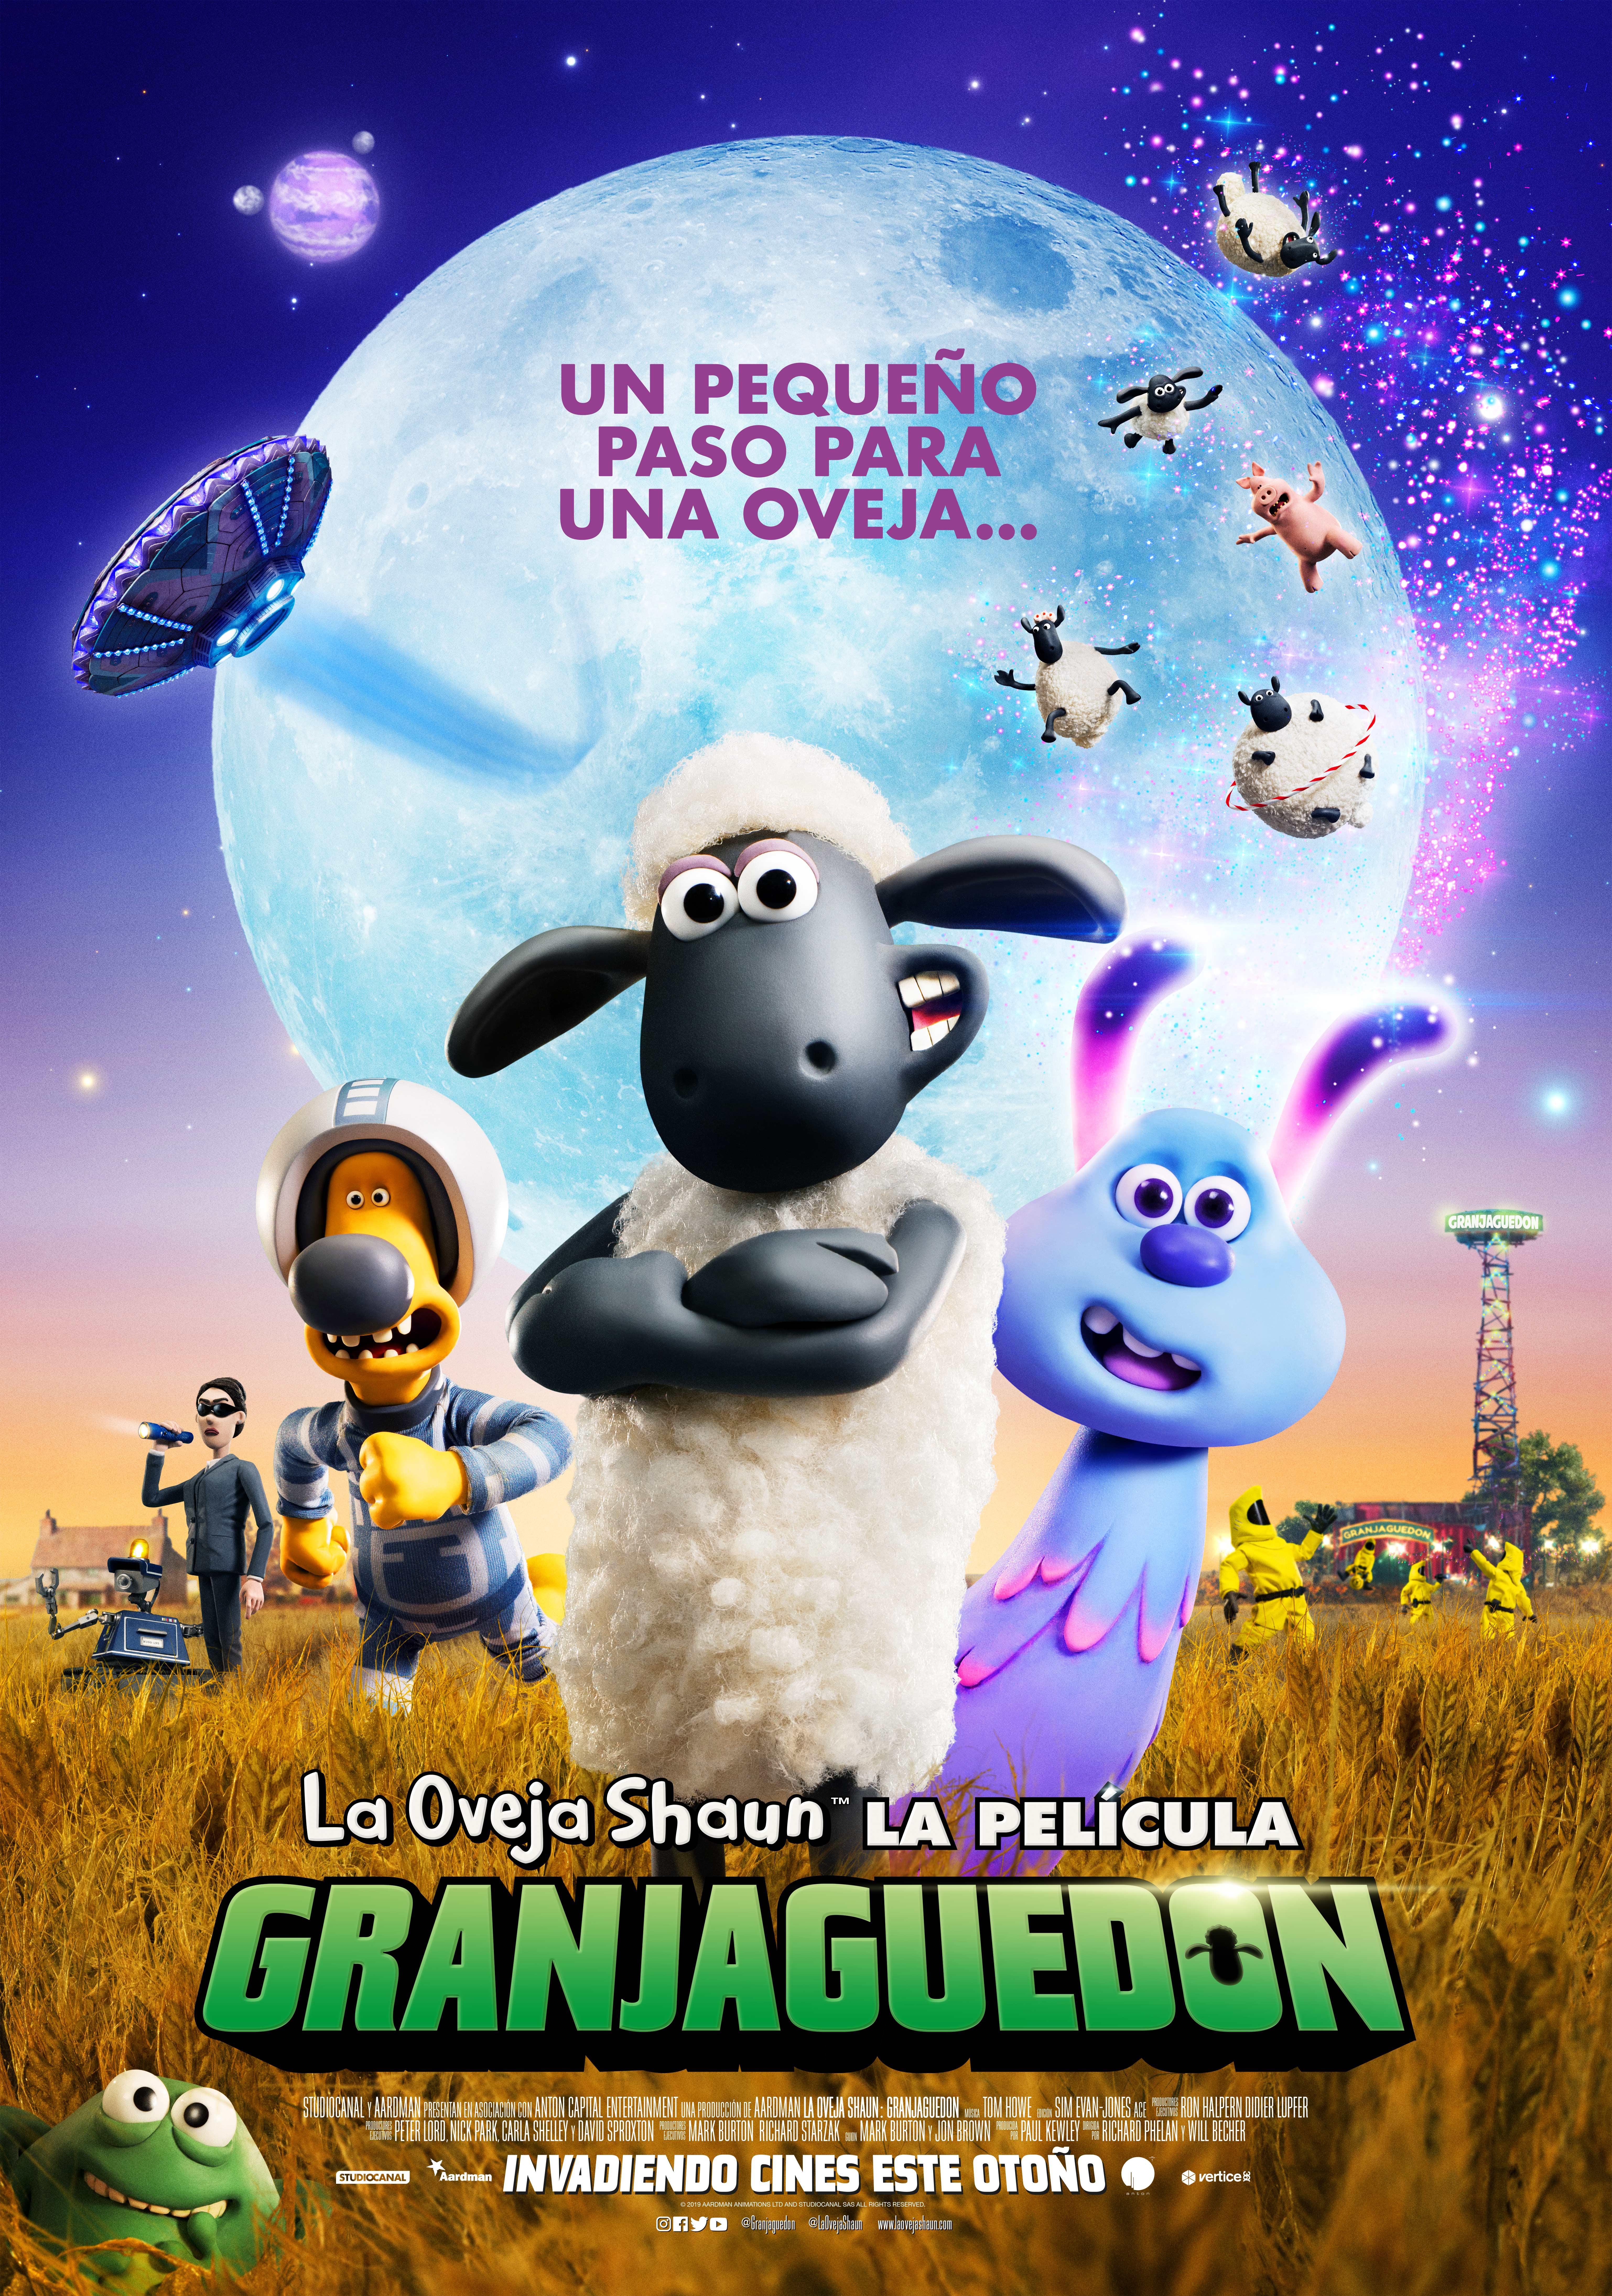 La oveja Shaun, la pelicula: GRANJAGUEDON